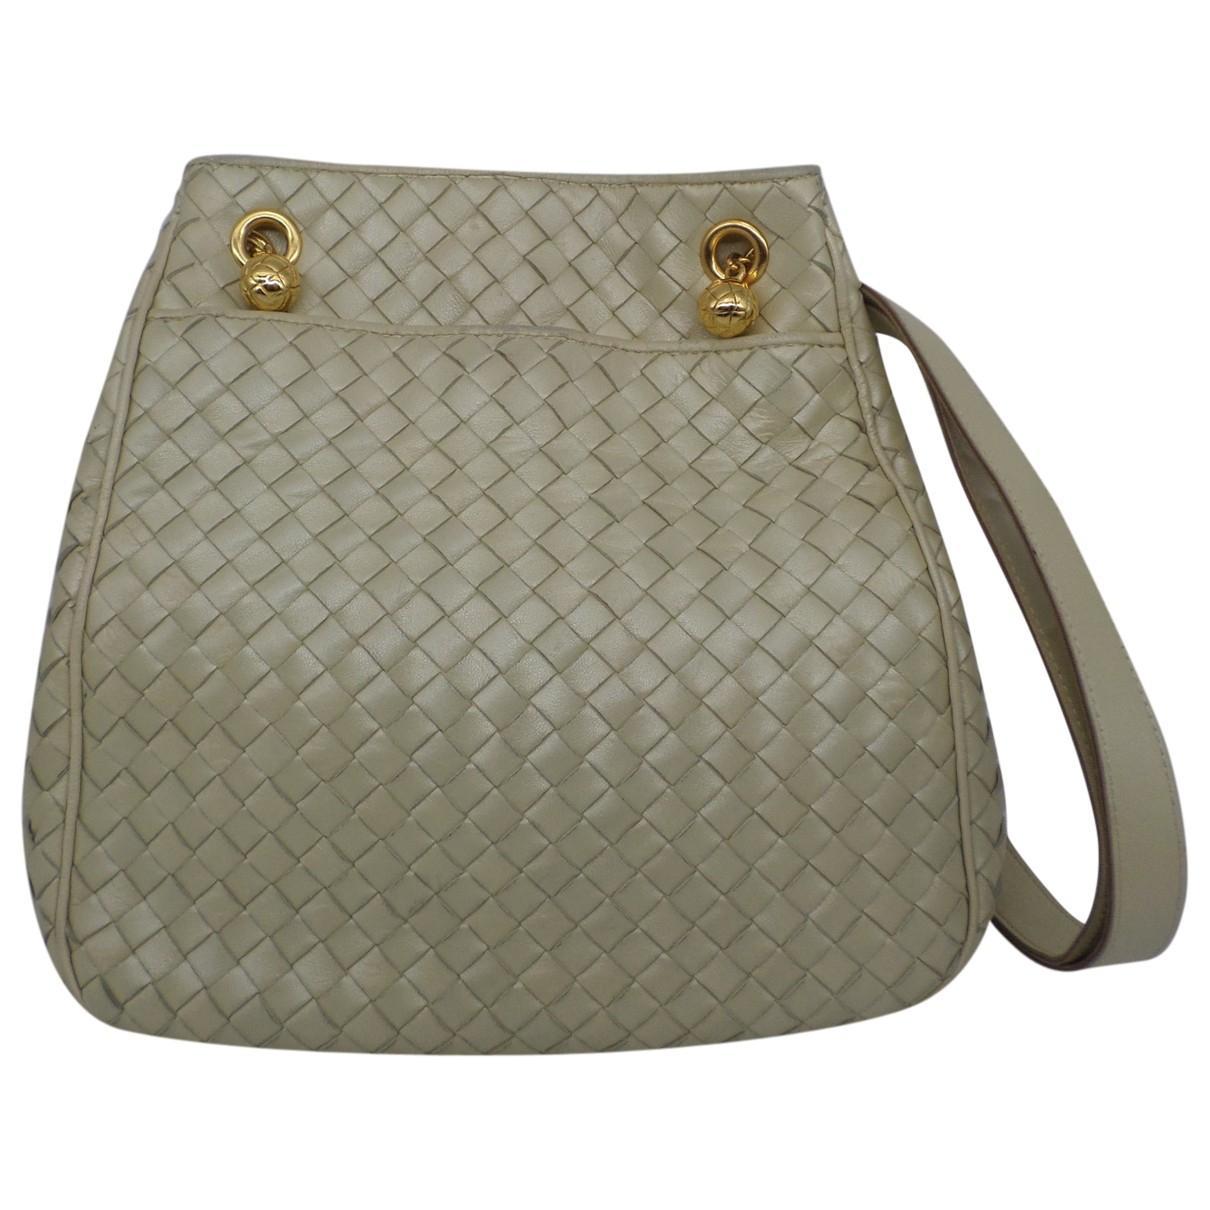 Bottega Veneta Leather Handbag in Natural - Lyst 4de8c1ed777ba